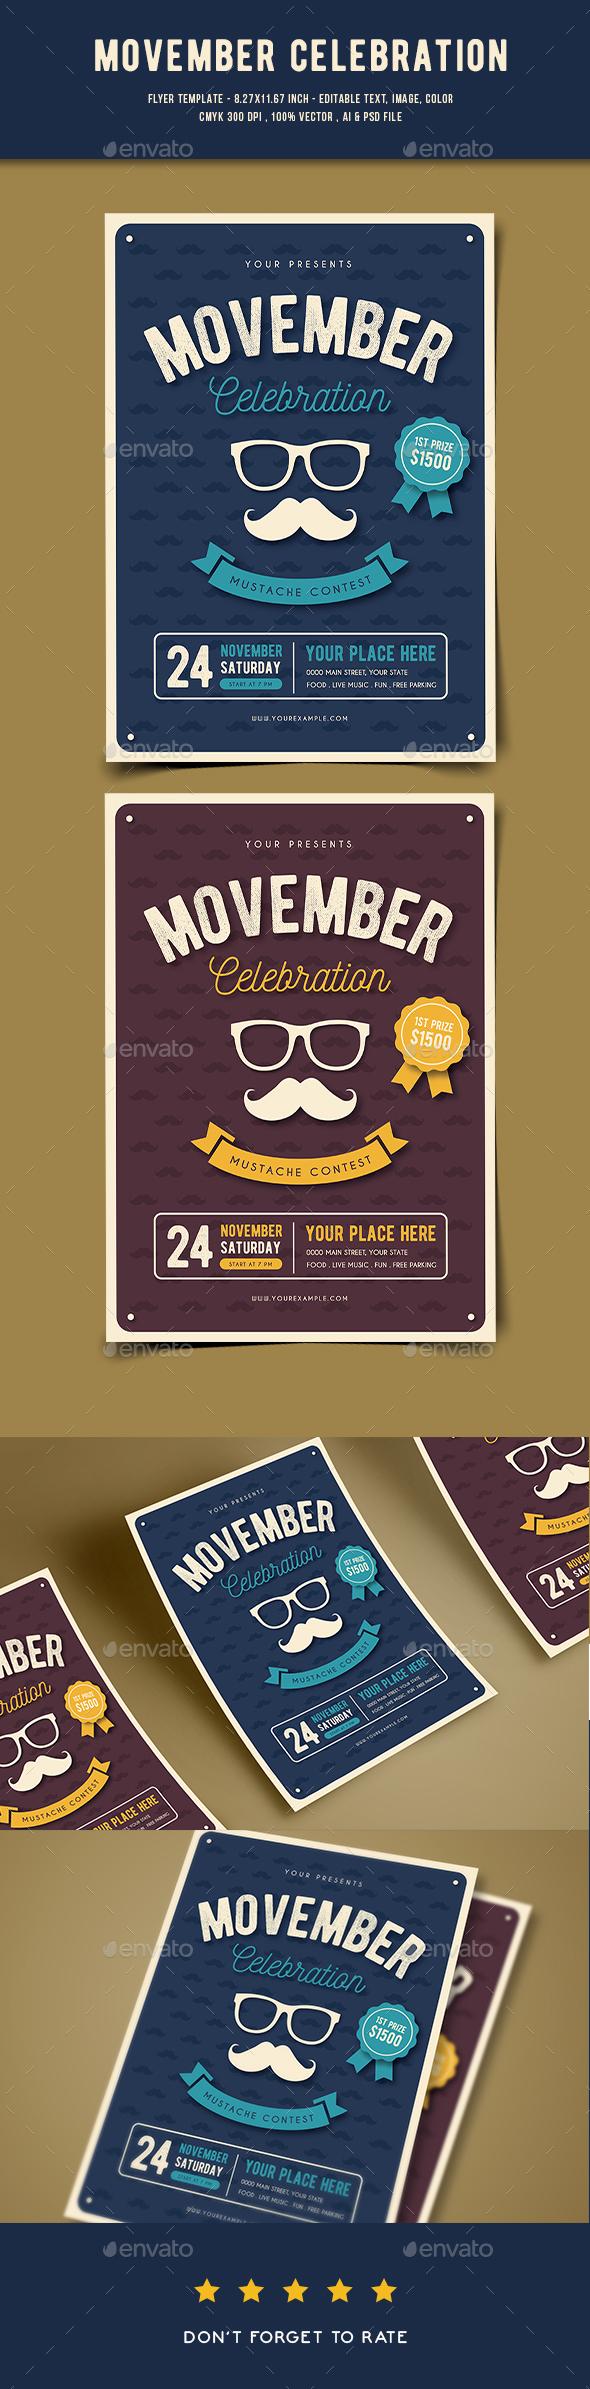 GraphicRiver Movember Flyer 20891265